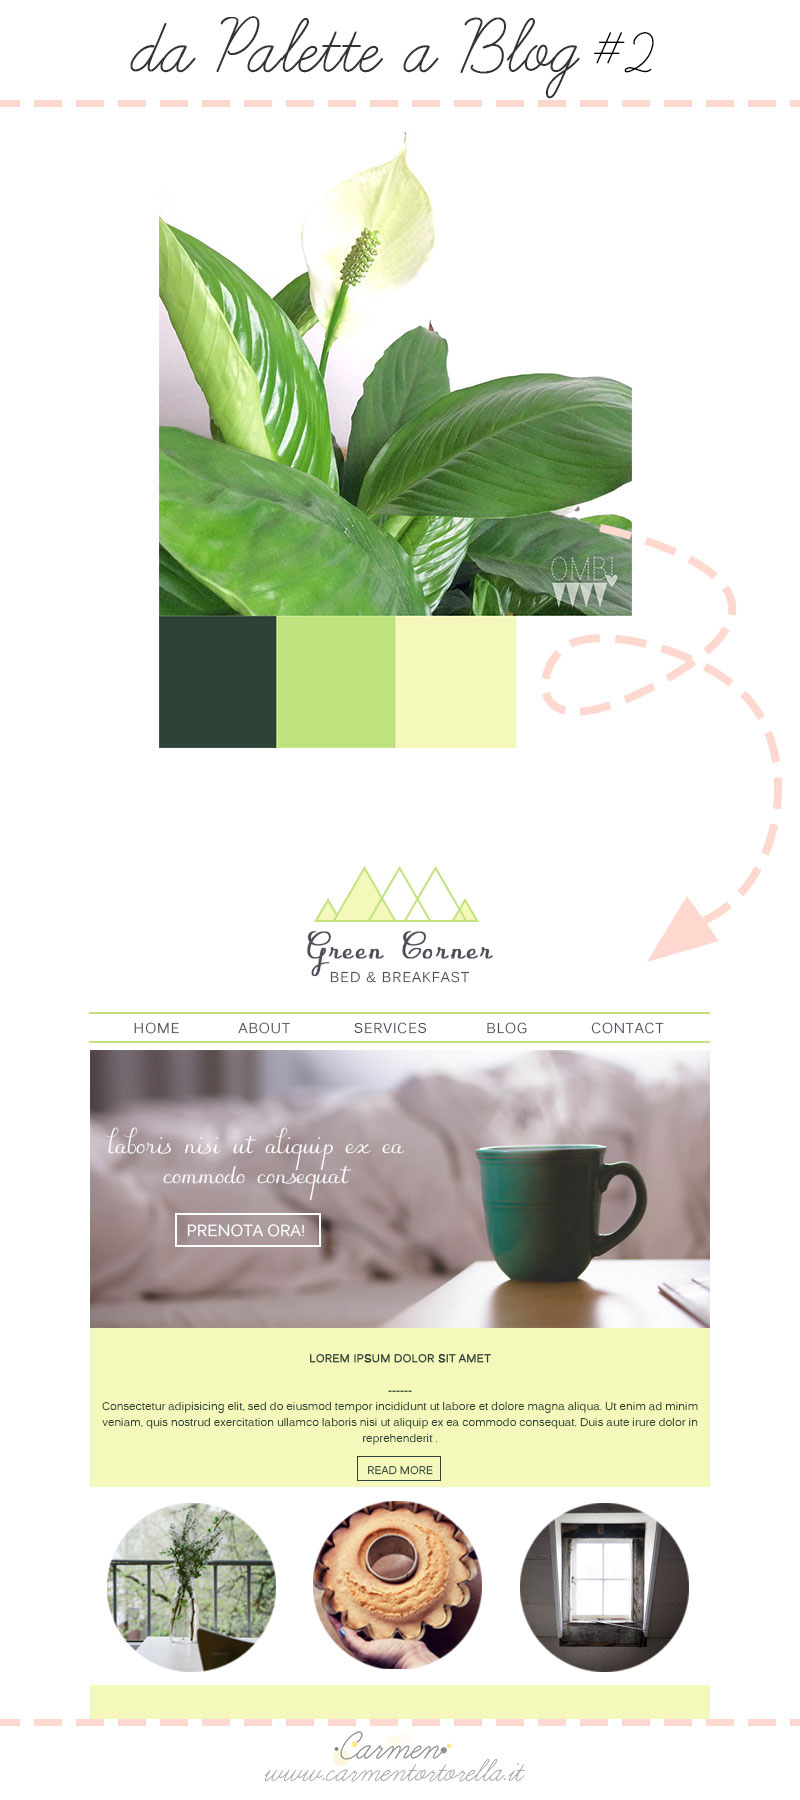 Da Palette a Blog design #1